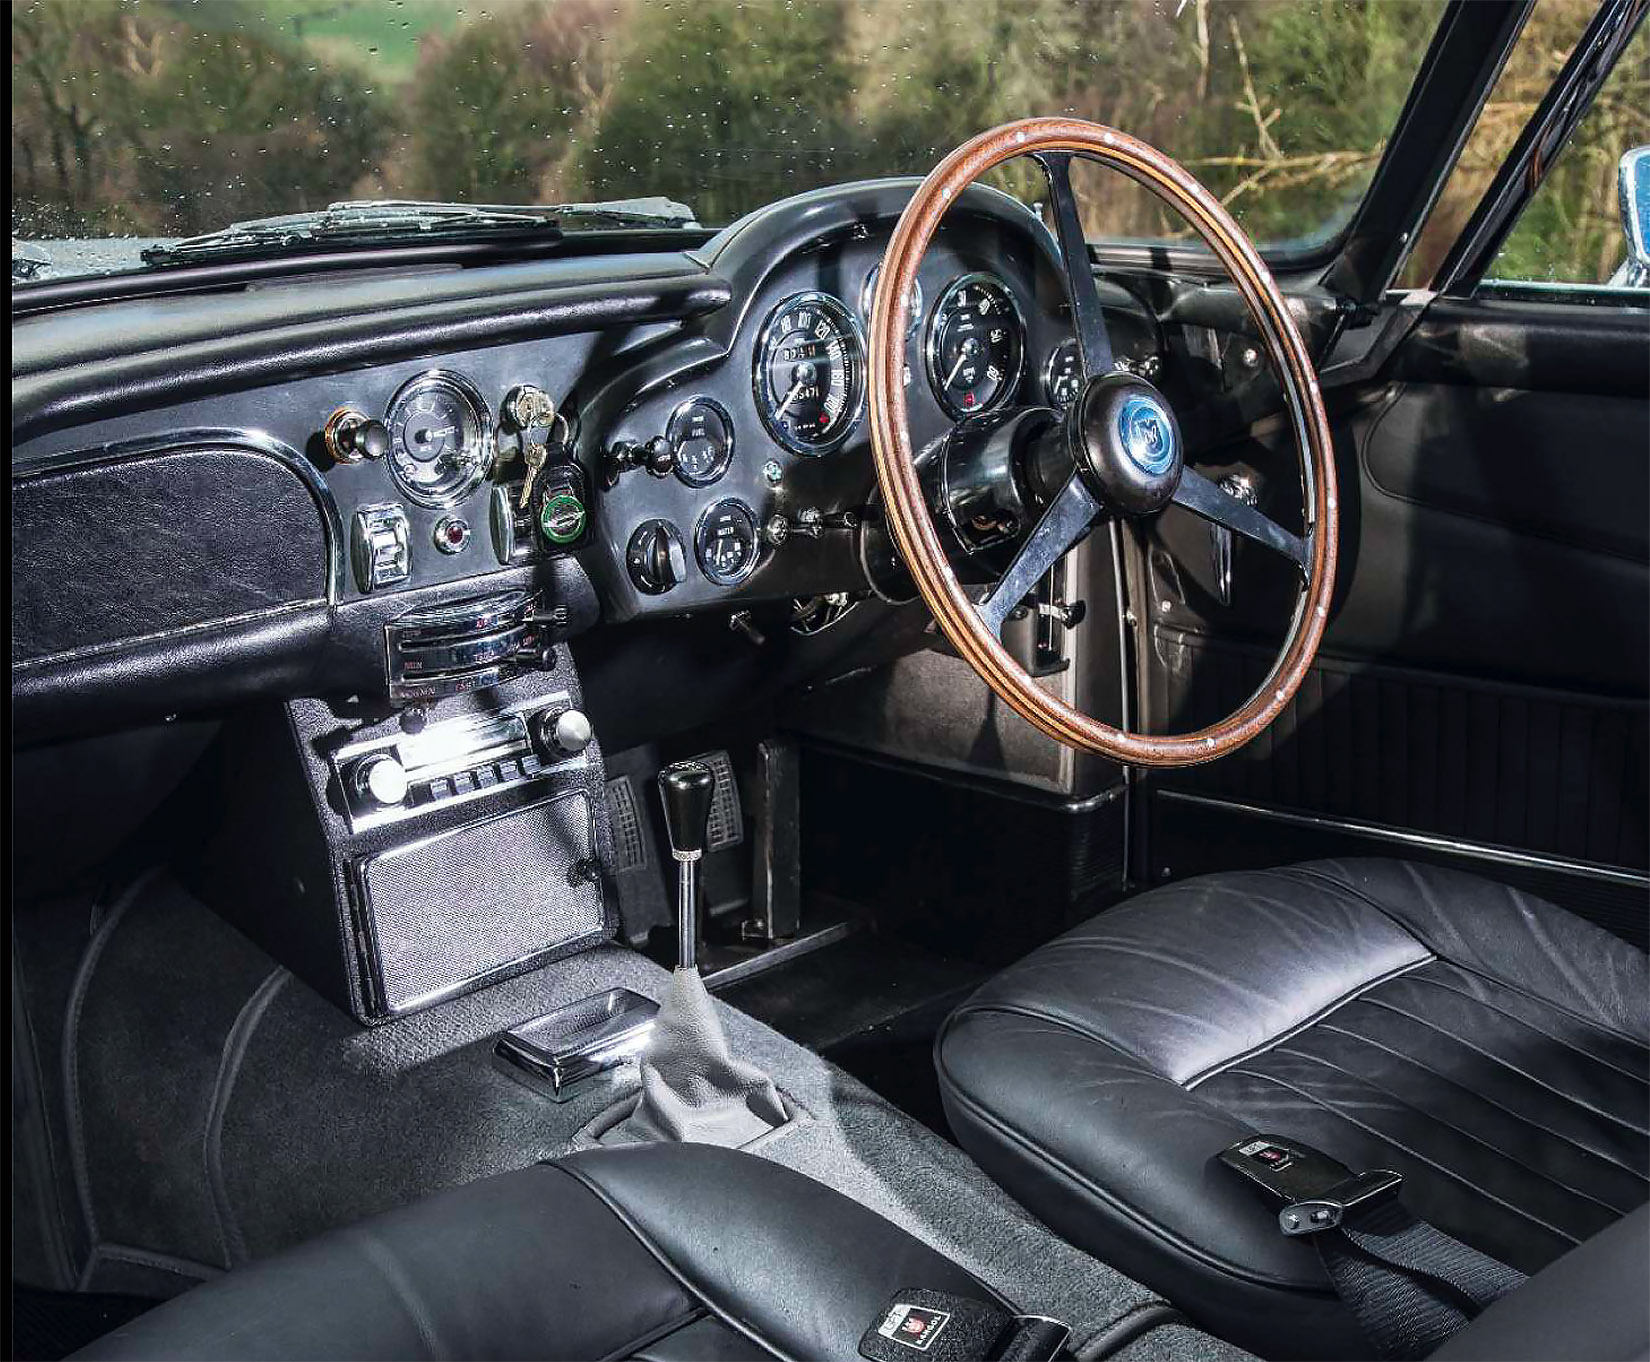 Voiture coupé anglais Aston Martin DB5 3 - Voiture coupé anglais Aston Martin DB5